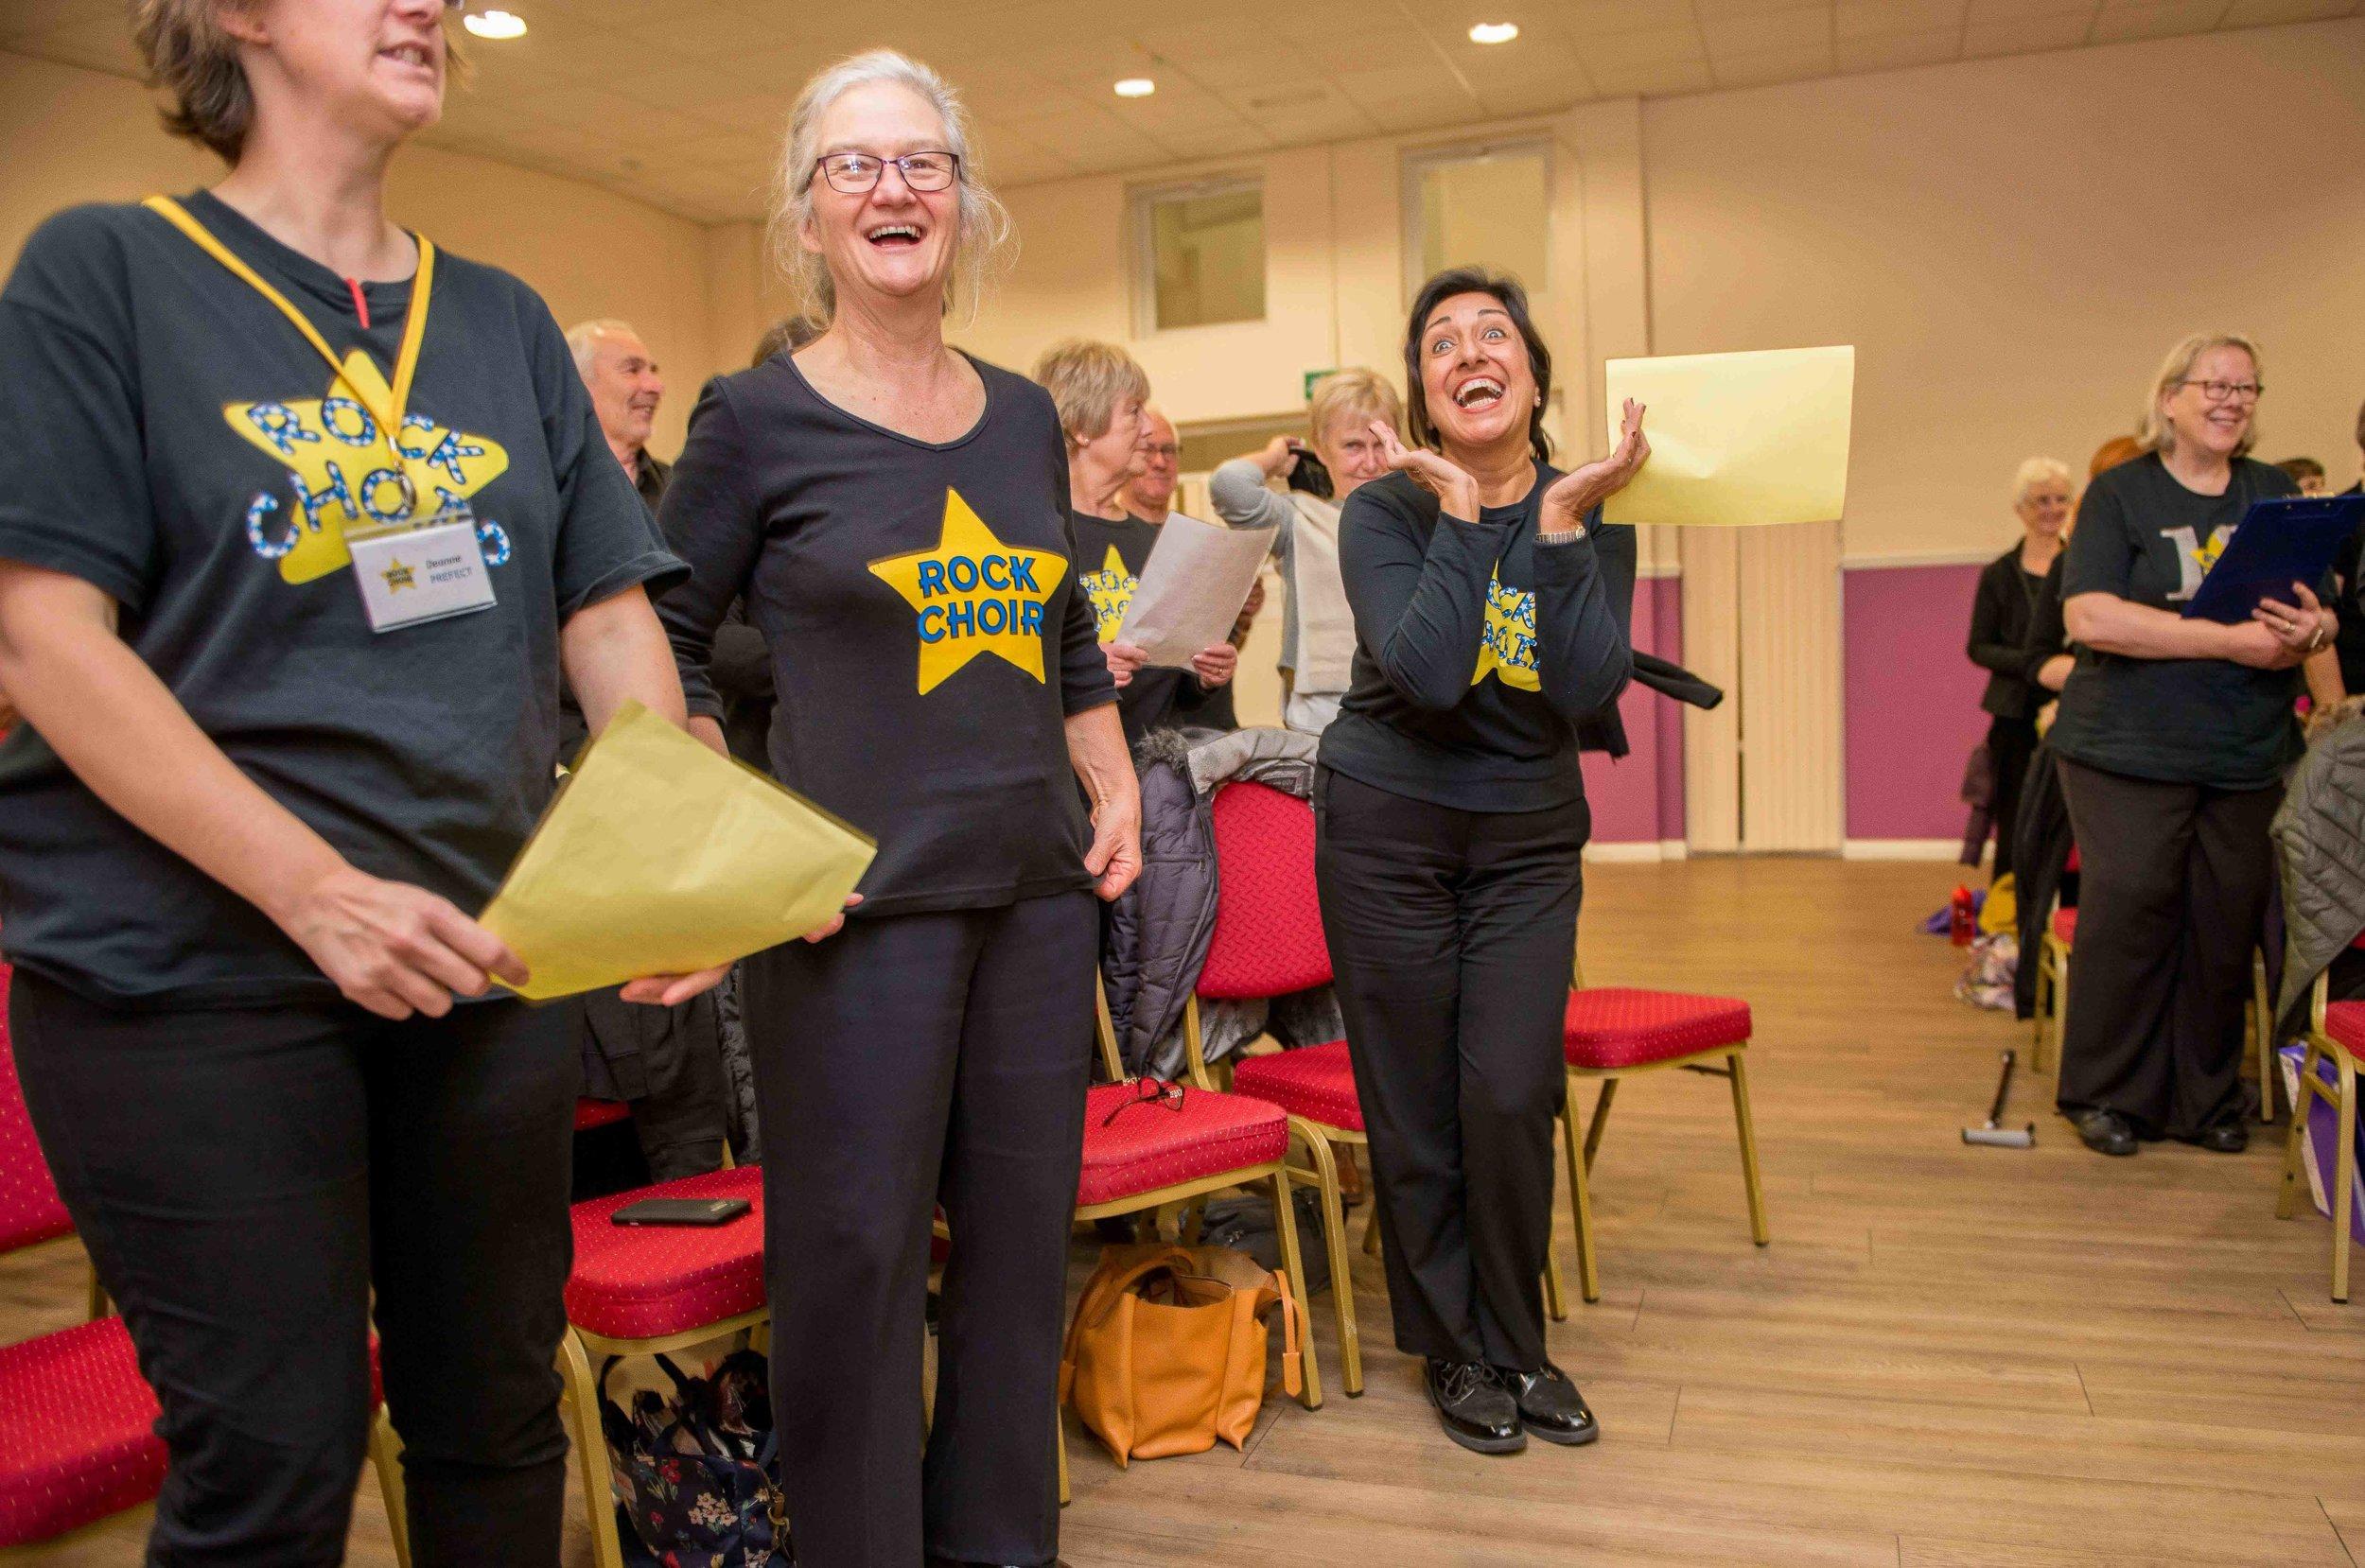 Community Choir - 6th November 2017, Mayfield Centre, Bradford